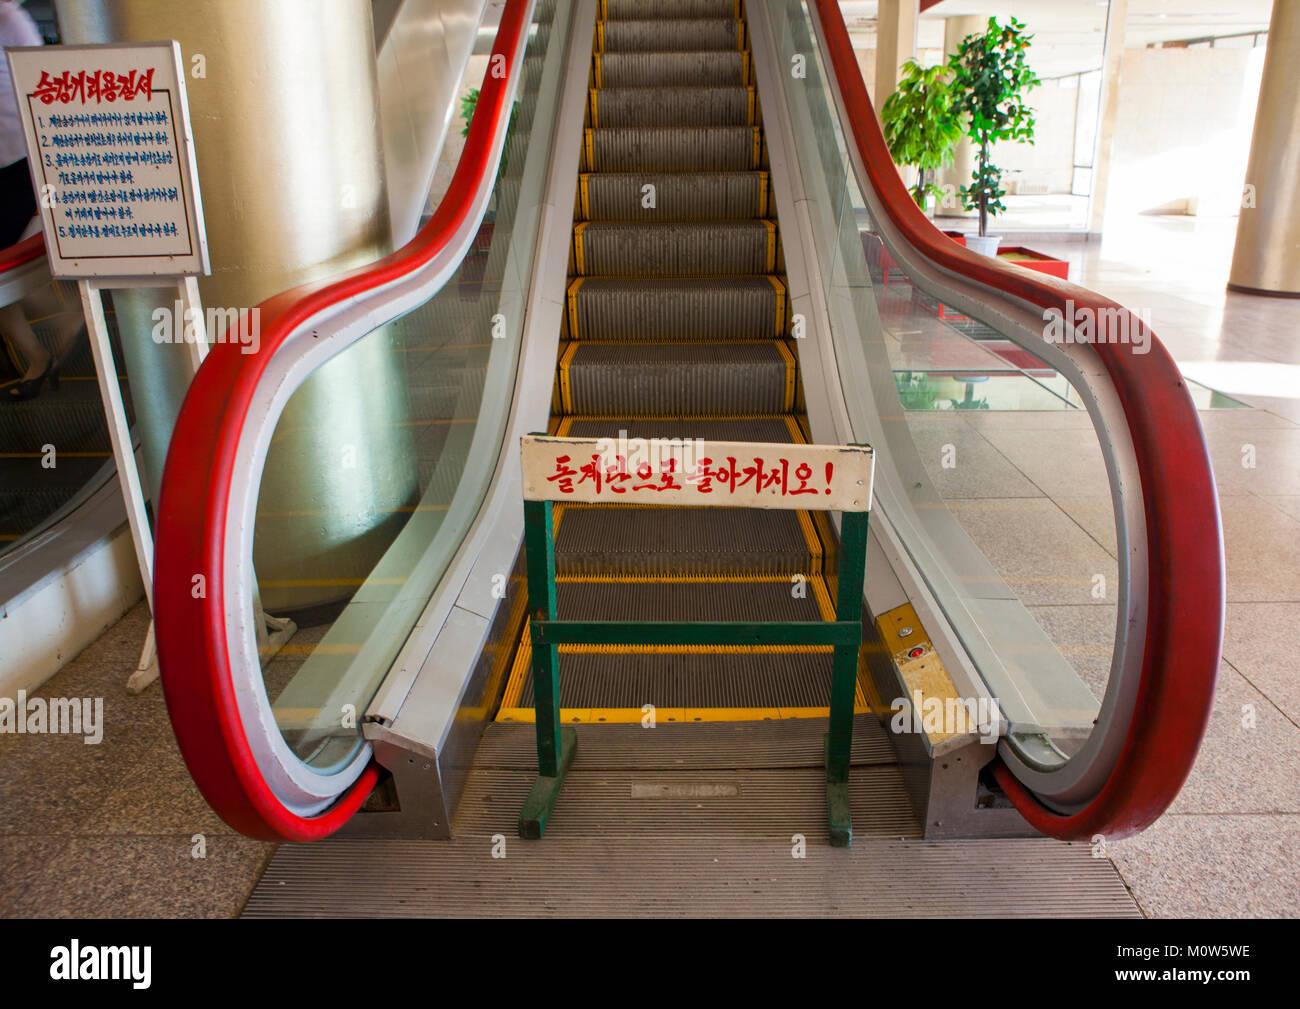 Escalators out of order in Songdowon international children's camp, Kangwon Province, Wonsan, North Korea - Stock Image